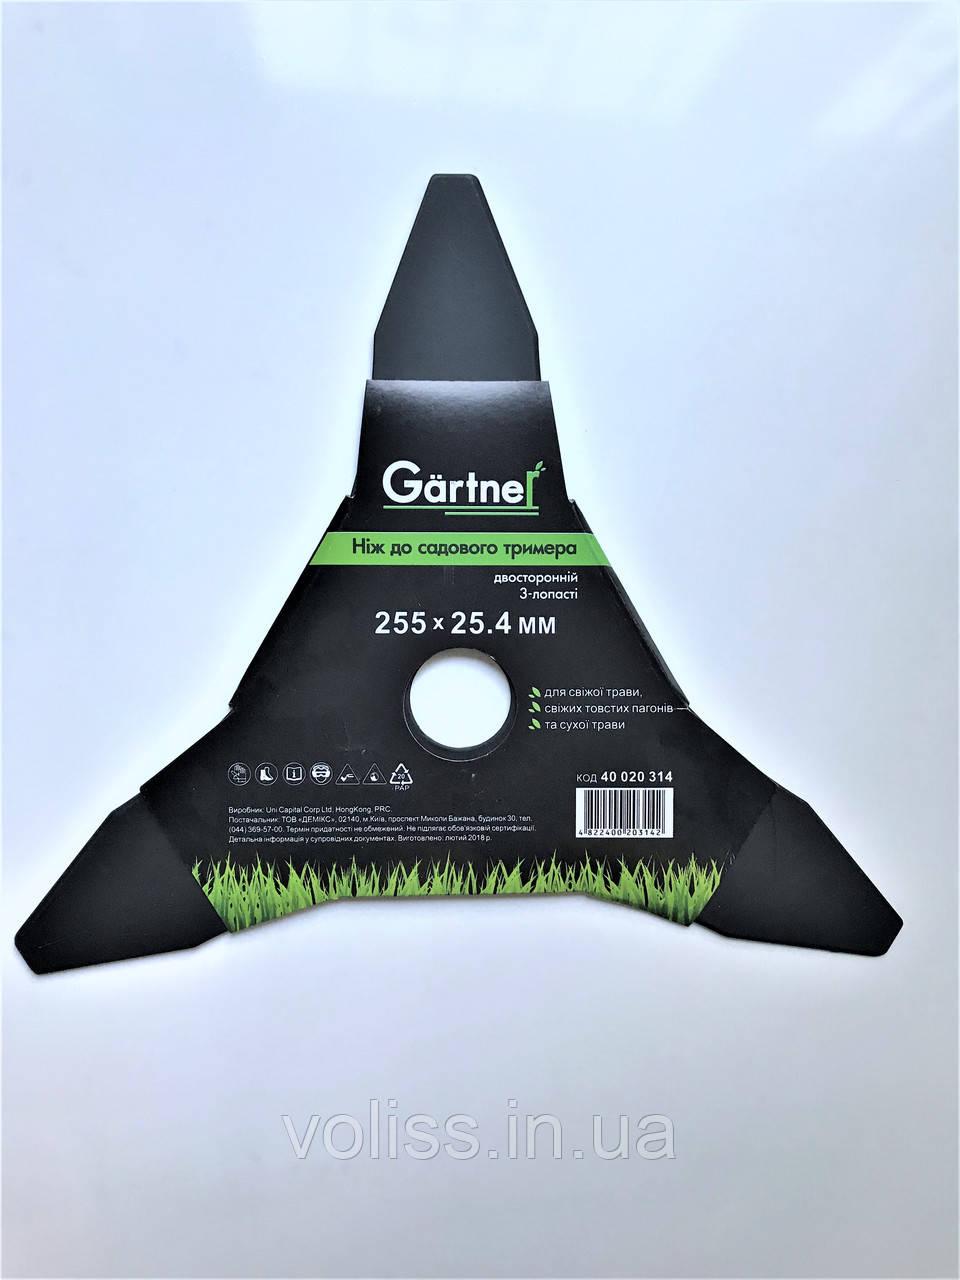 Нож для бензокосы 255х25.4мм 3-лопасти двухсторонний Gartner